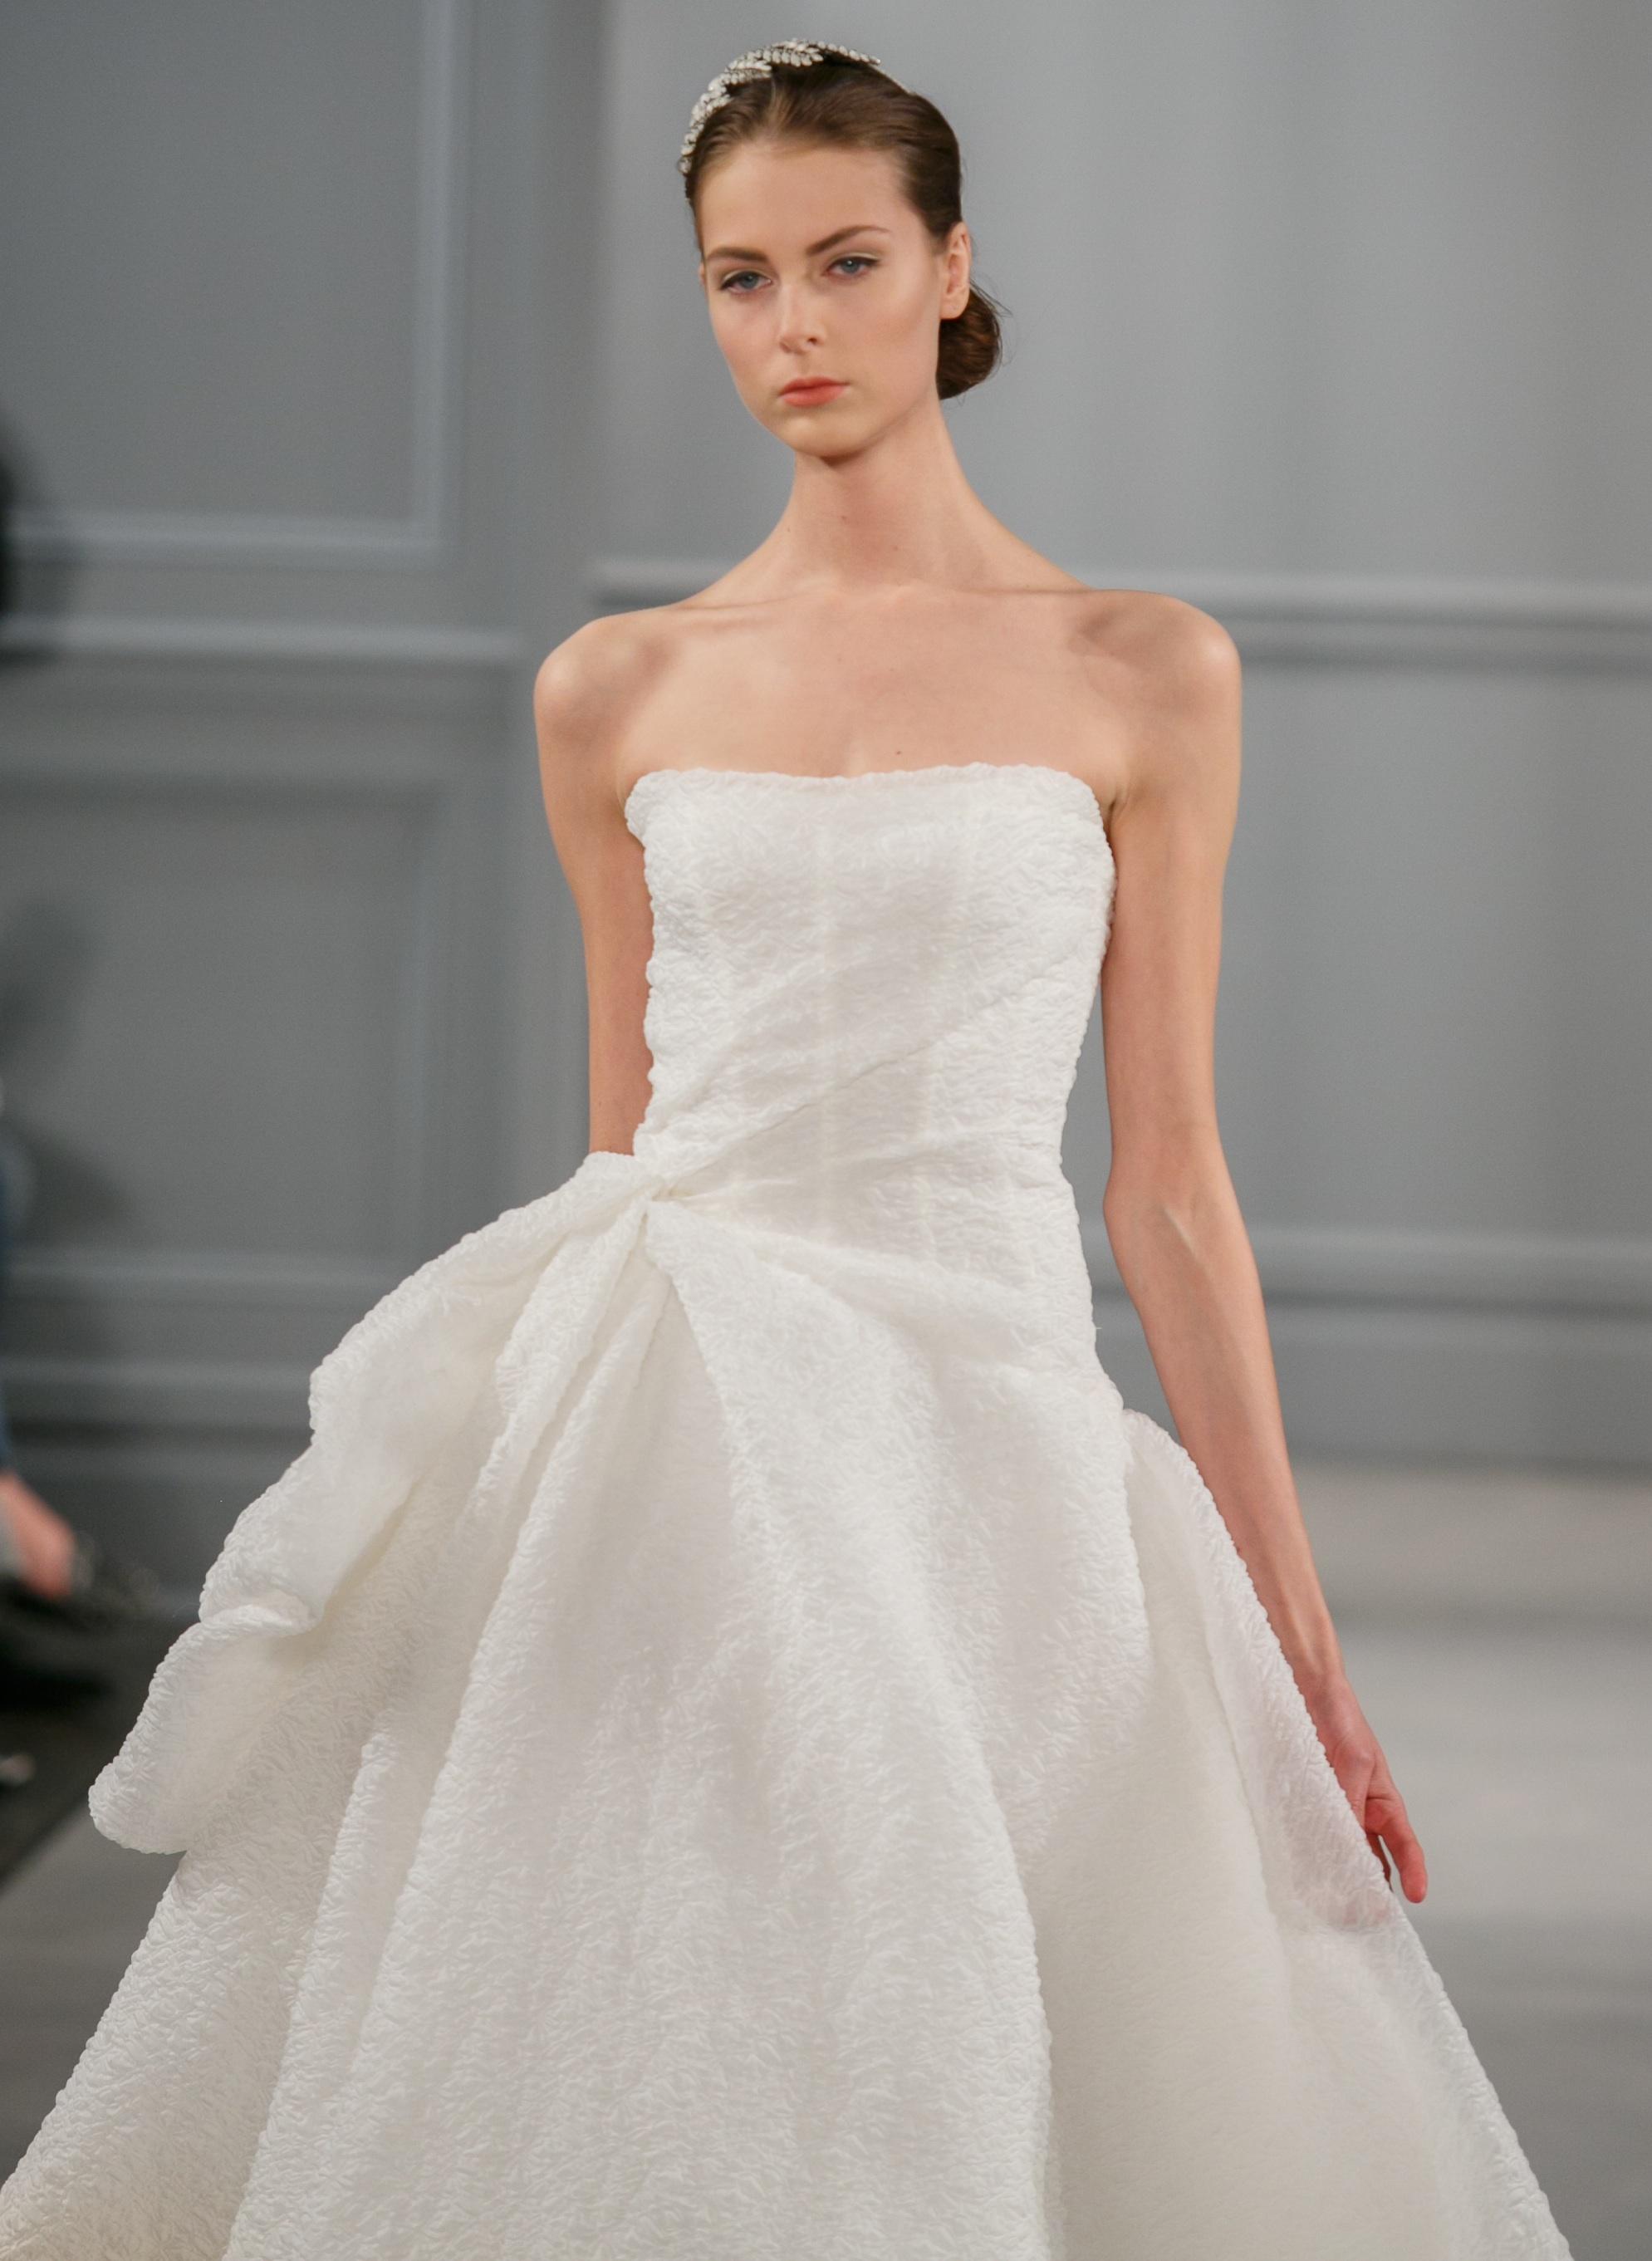 Spring 2014 wedding dress monique lhuillier bridal paris for Wedding dress monique lhuillier